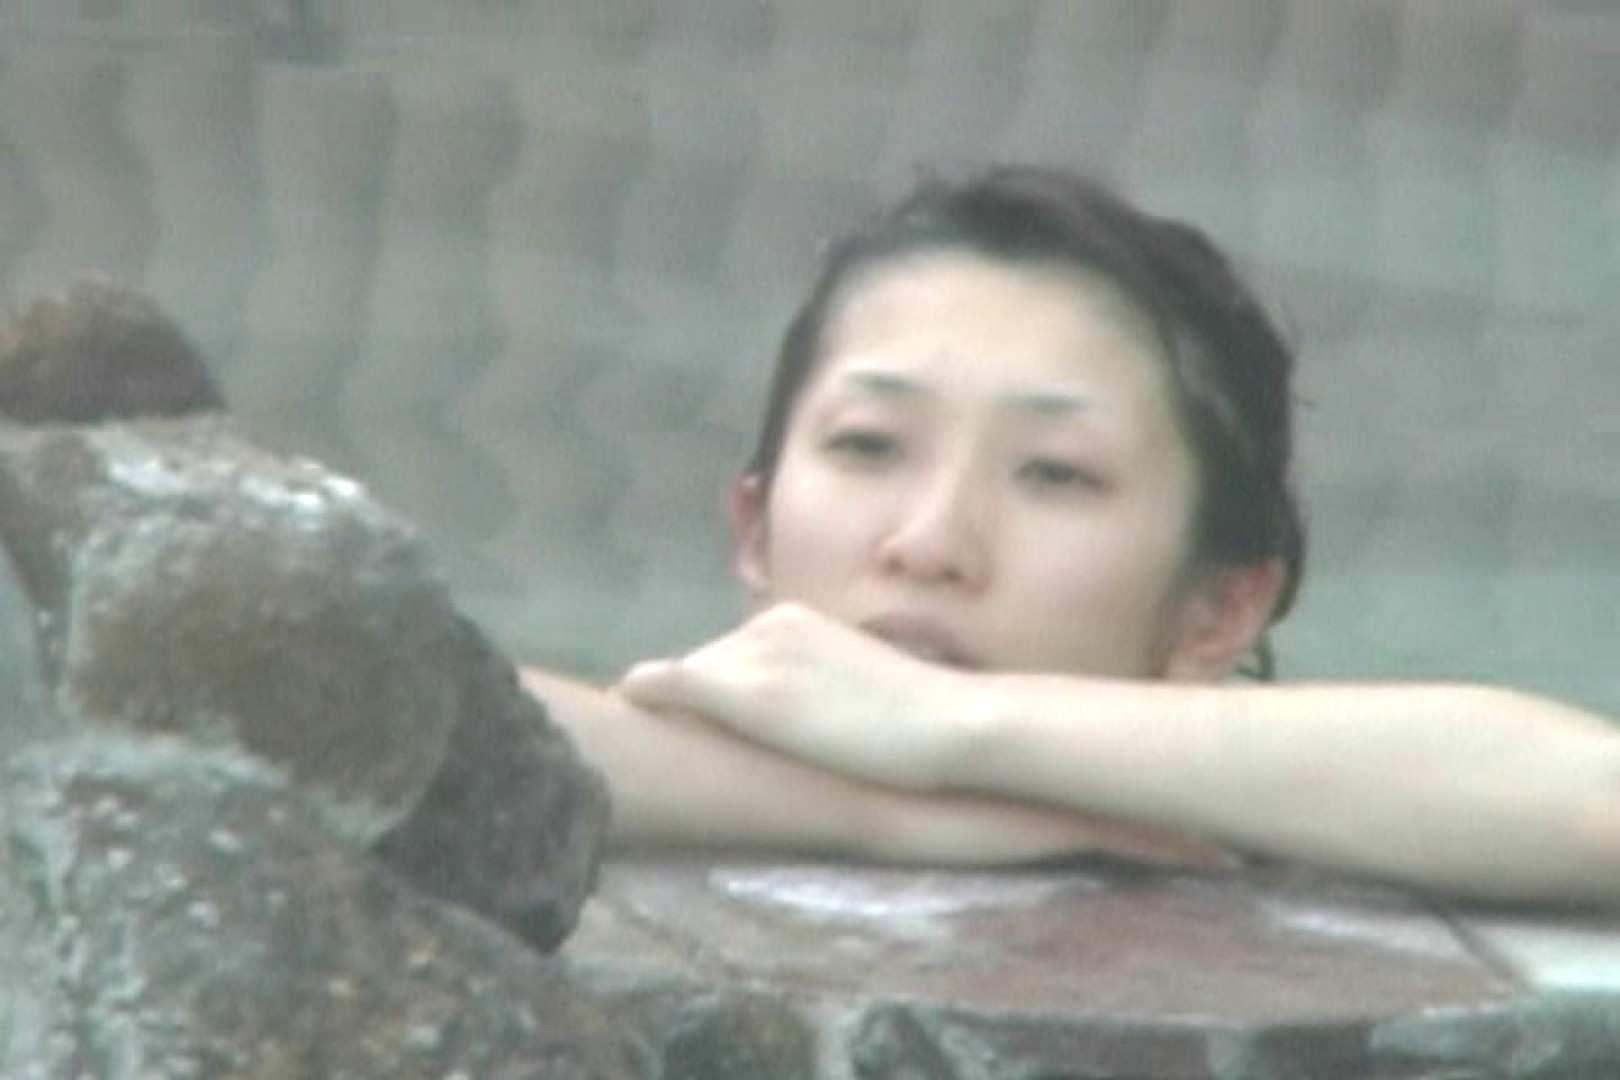 Aquaな露天風呂Vol.588 0  41連発 15